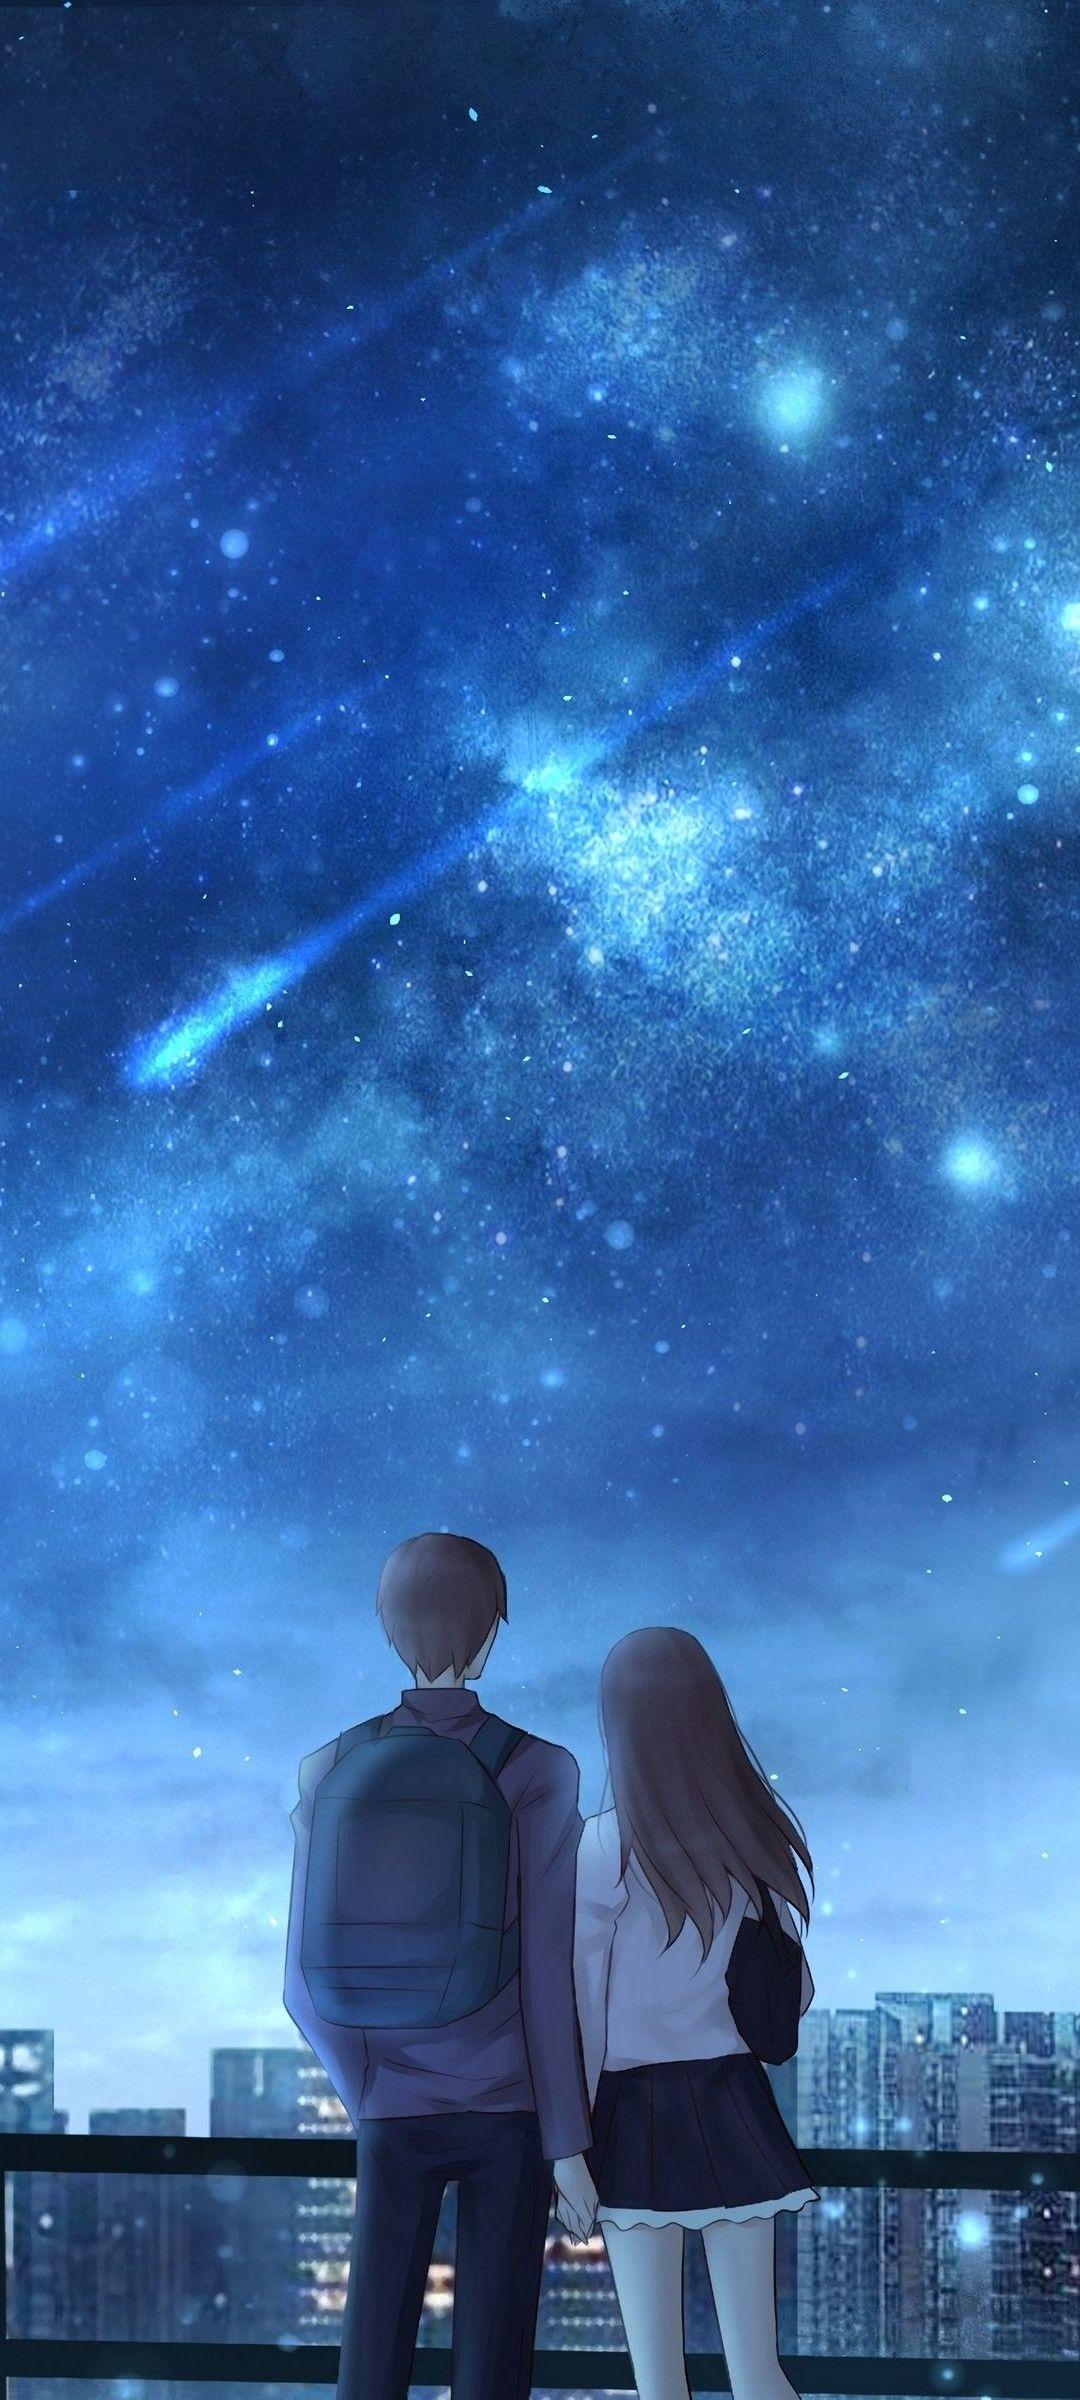 Pin oleh Ziang Fack di อนิเมะ3D di 2020 Gambar anime